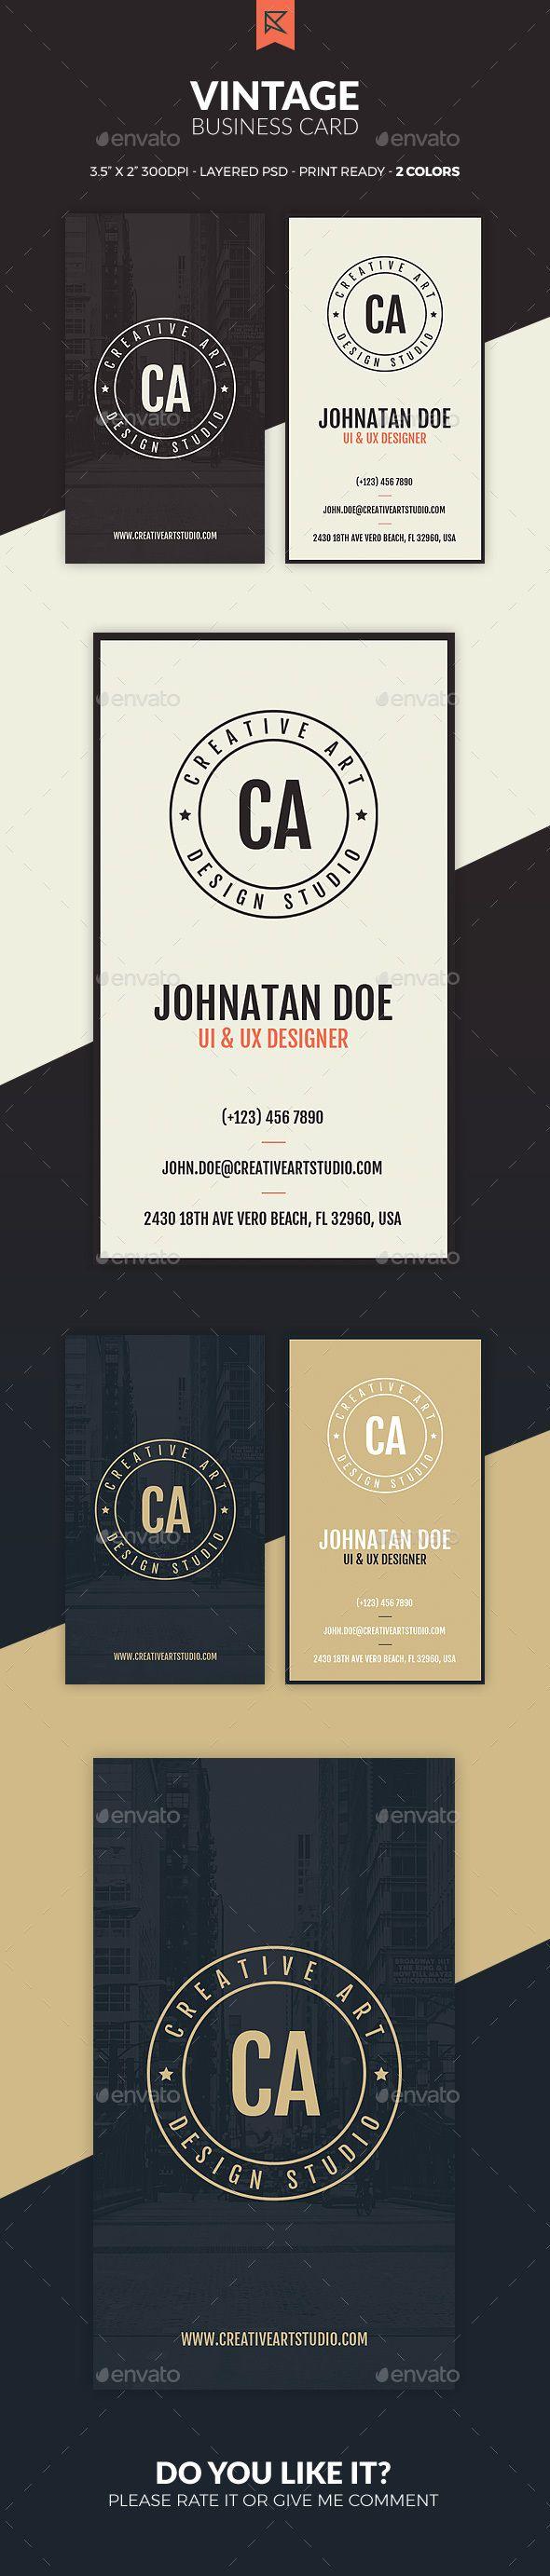 Vintage Business Card - #Business #Cards Print Templates Download here: https://graphicriver.net/item/vintage-business-card/20030943?ref=alena994